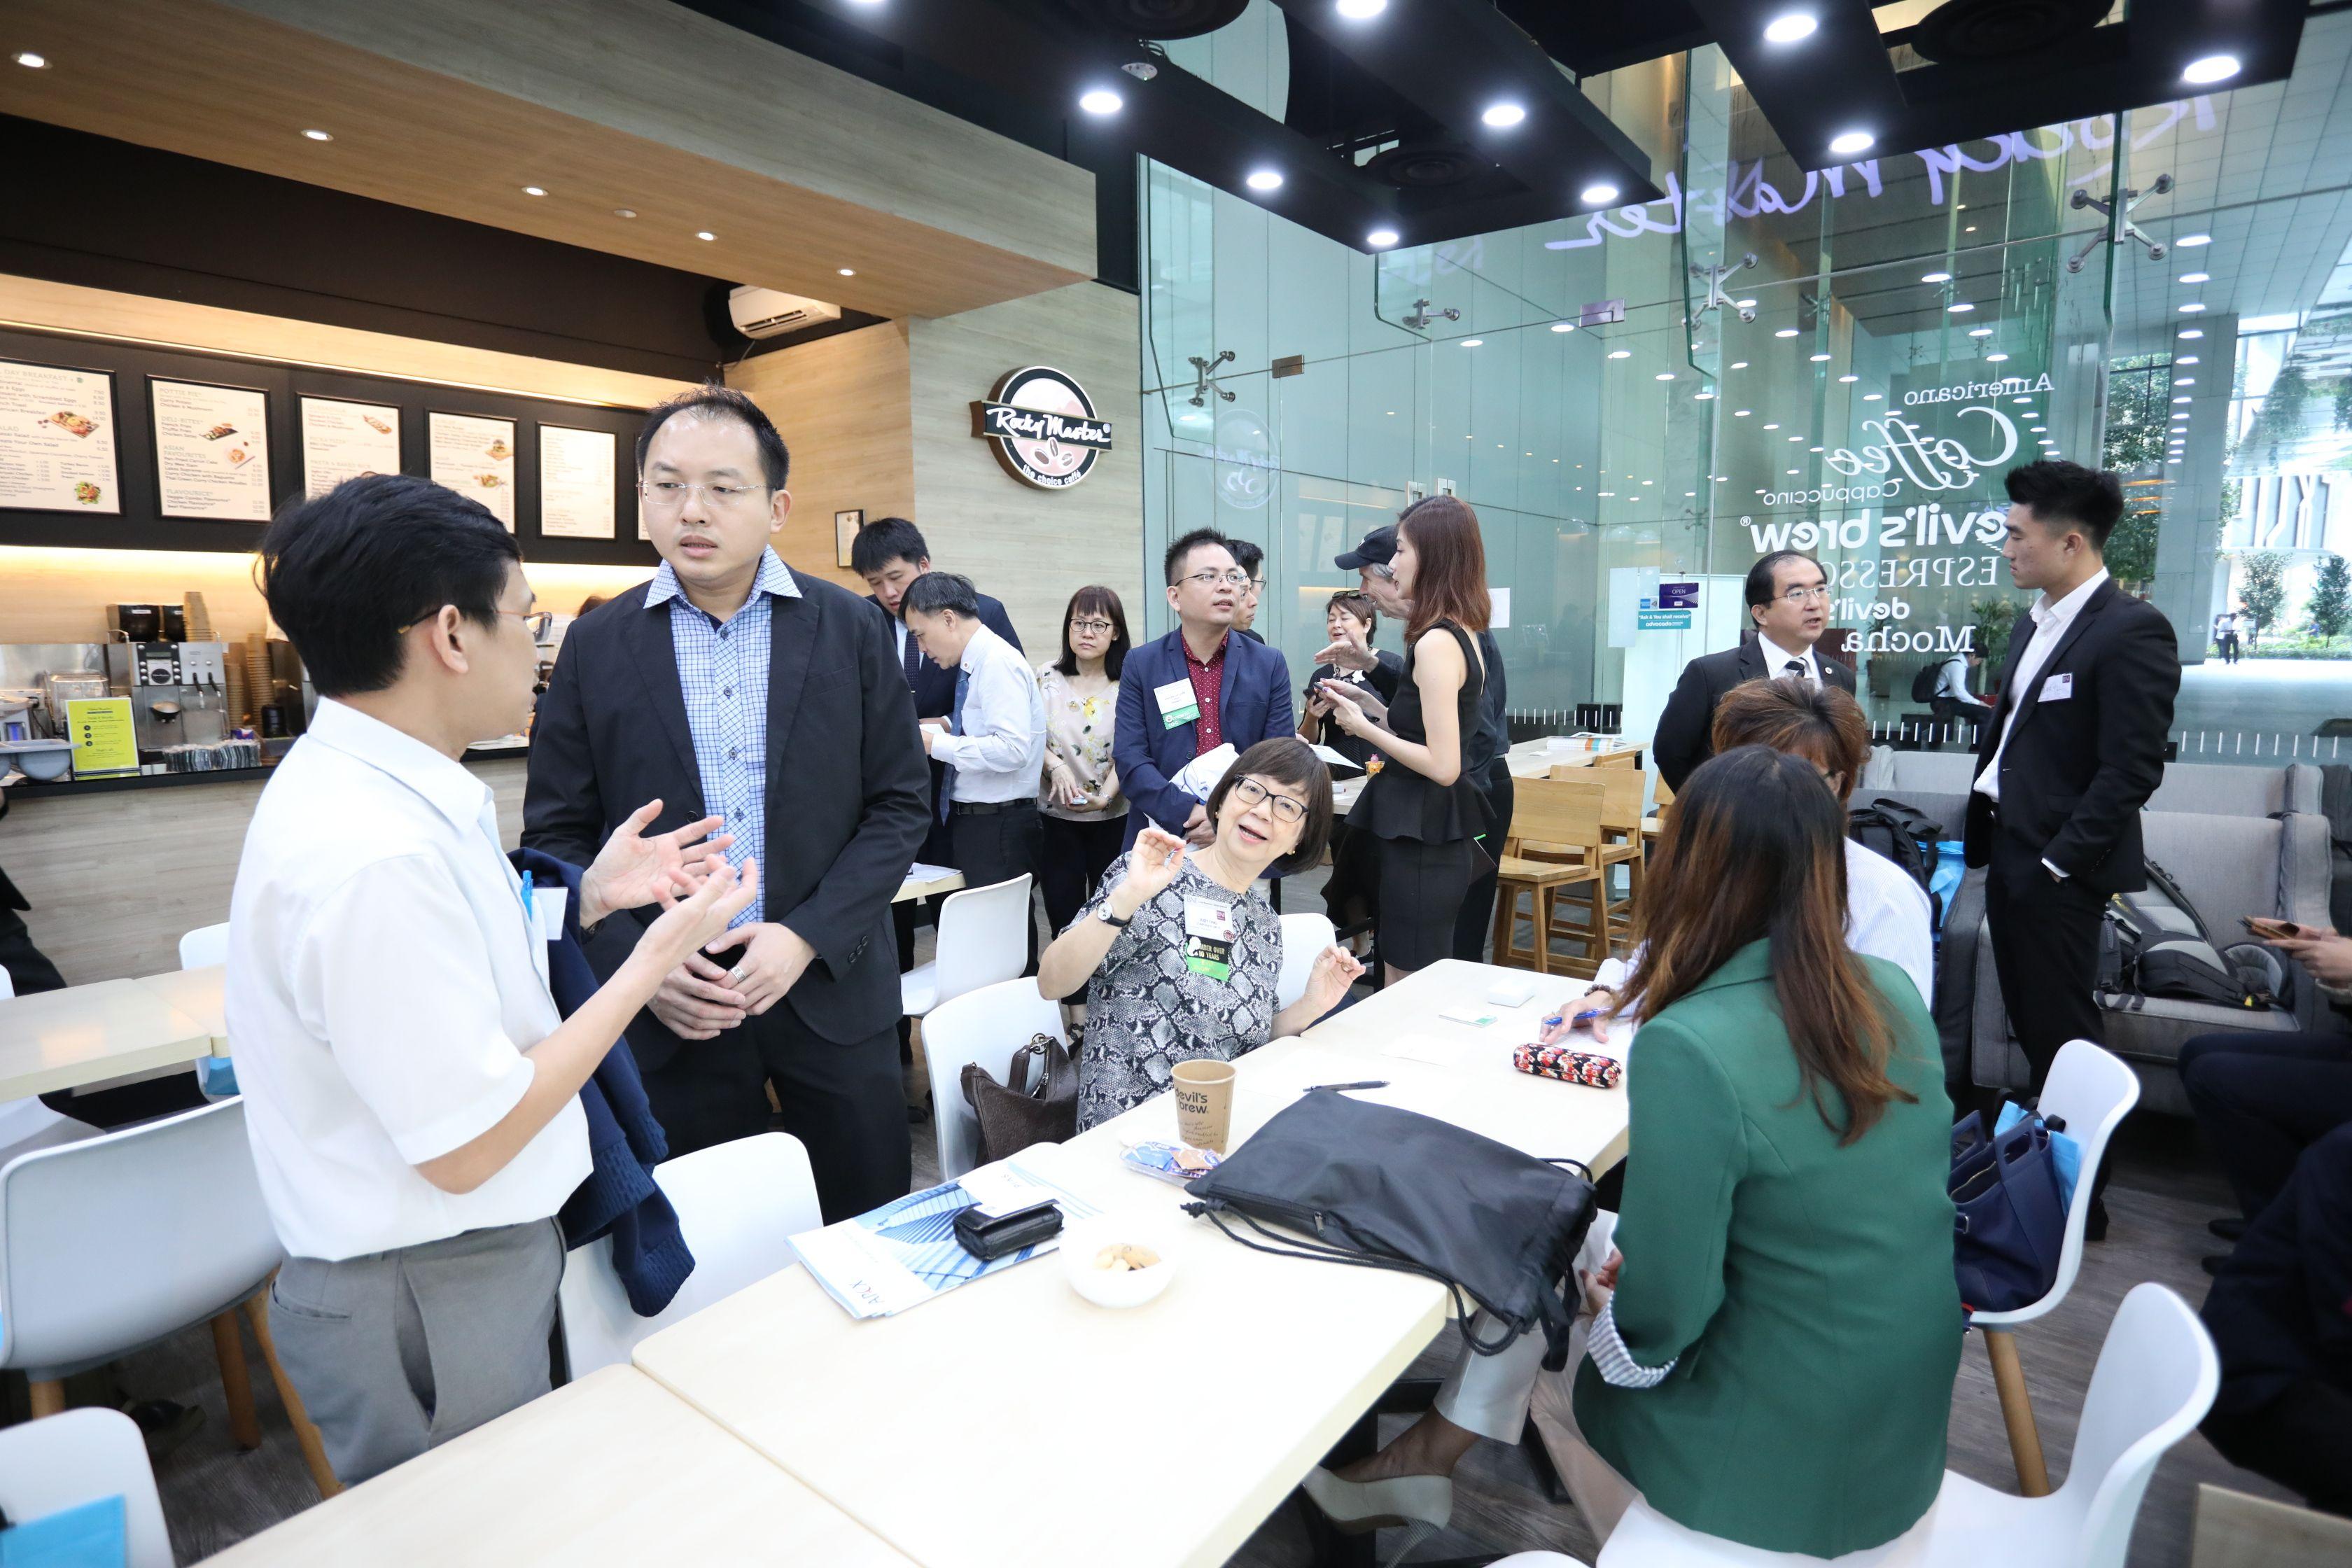 Bni Singapore Pinnacle Busines Opportunites Day Bod 2019 Coaching Business Recruitment Training Singapore